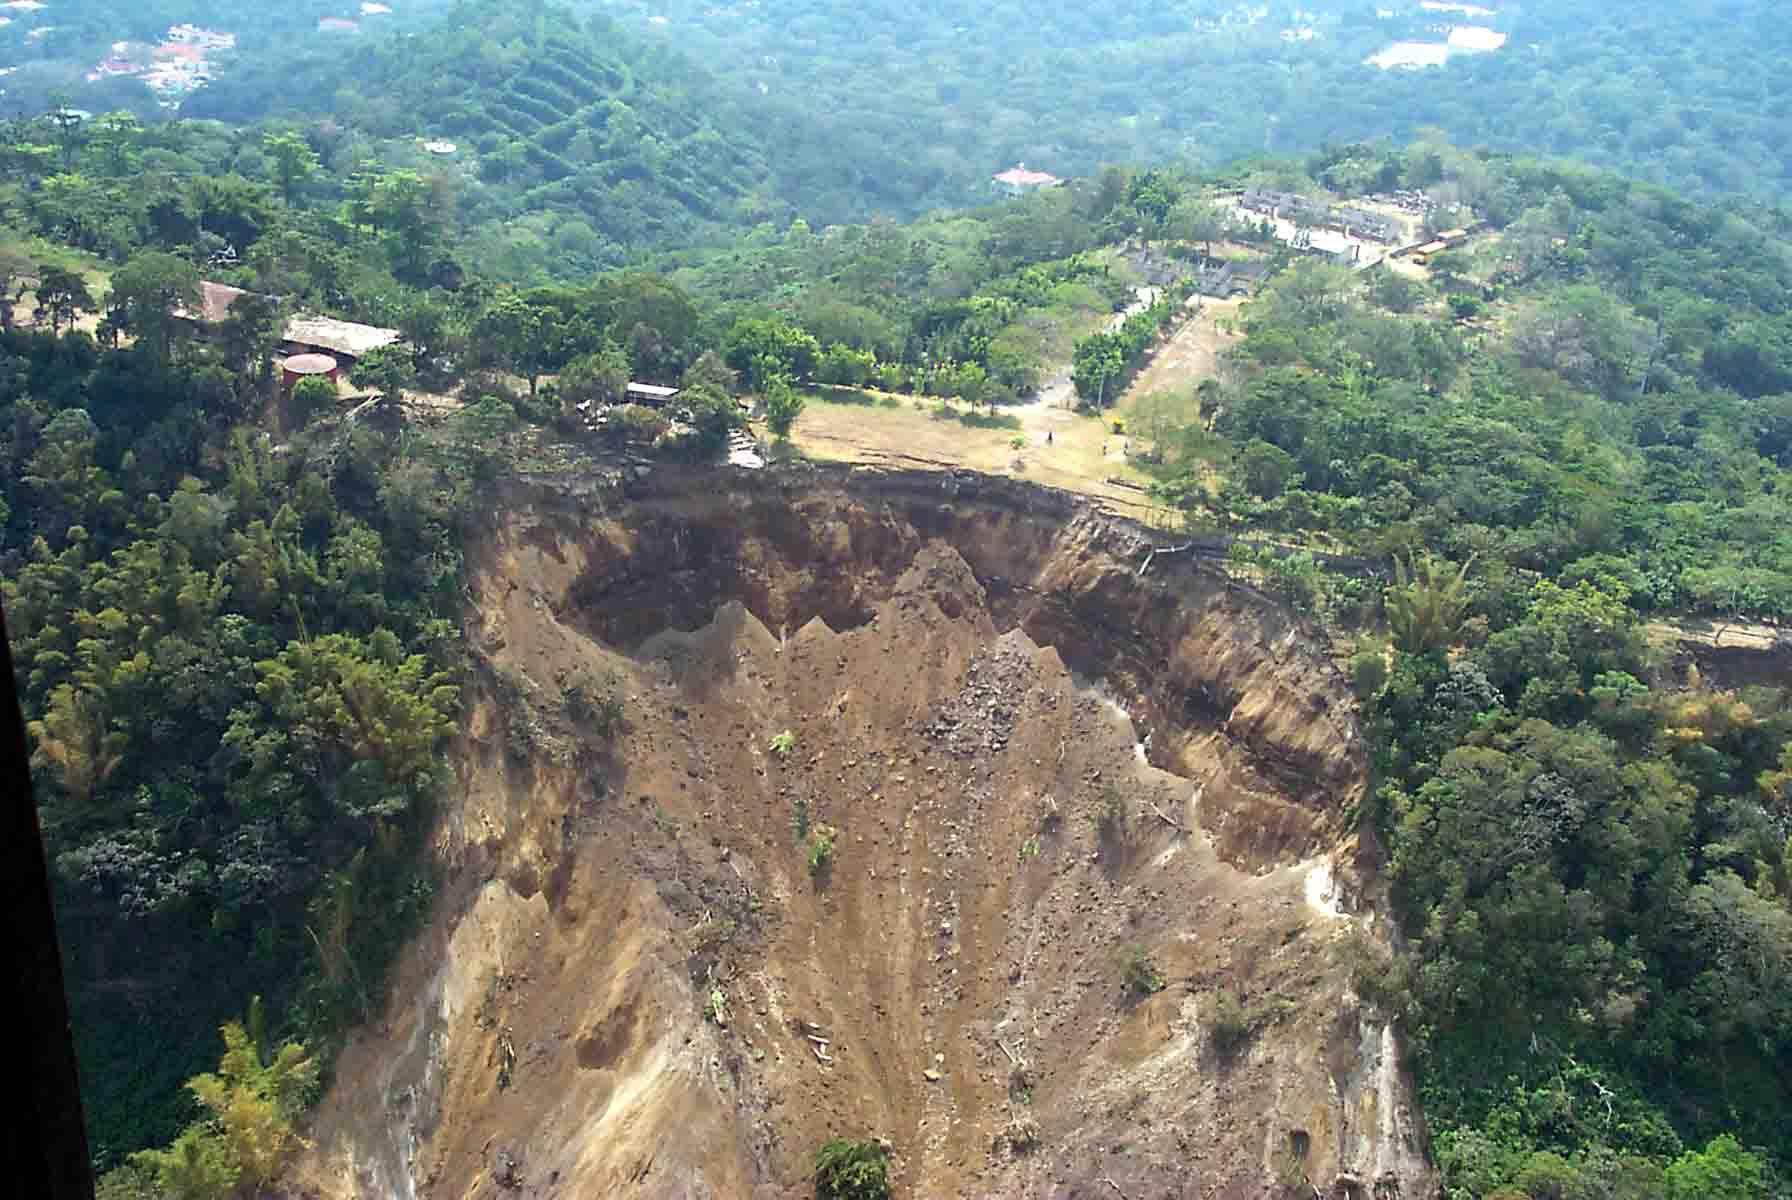 Landslide kills 9 people in Calabar - Premium Times Nigeria